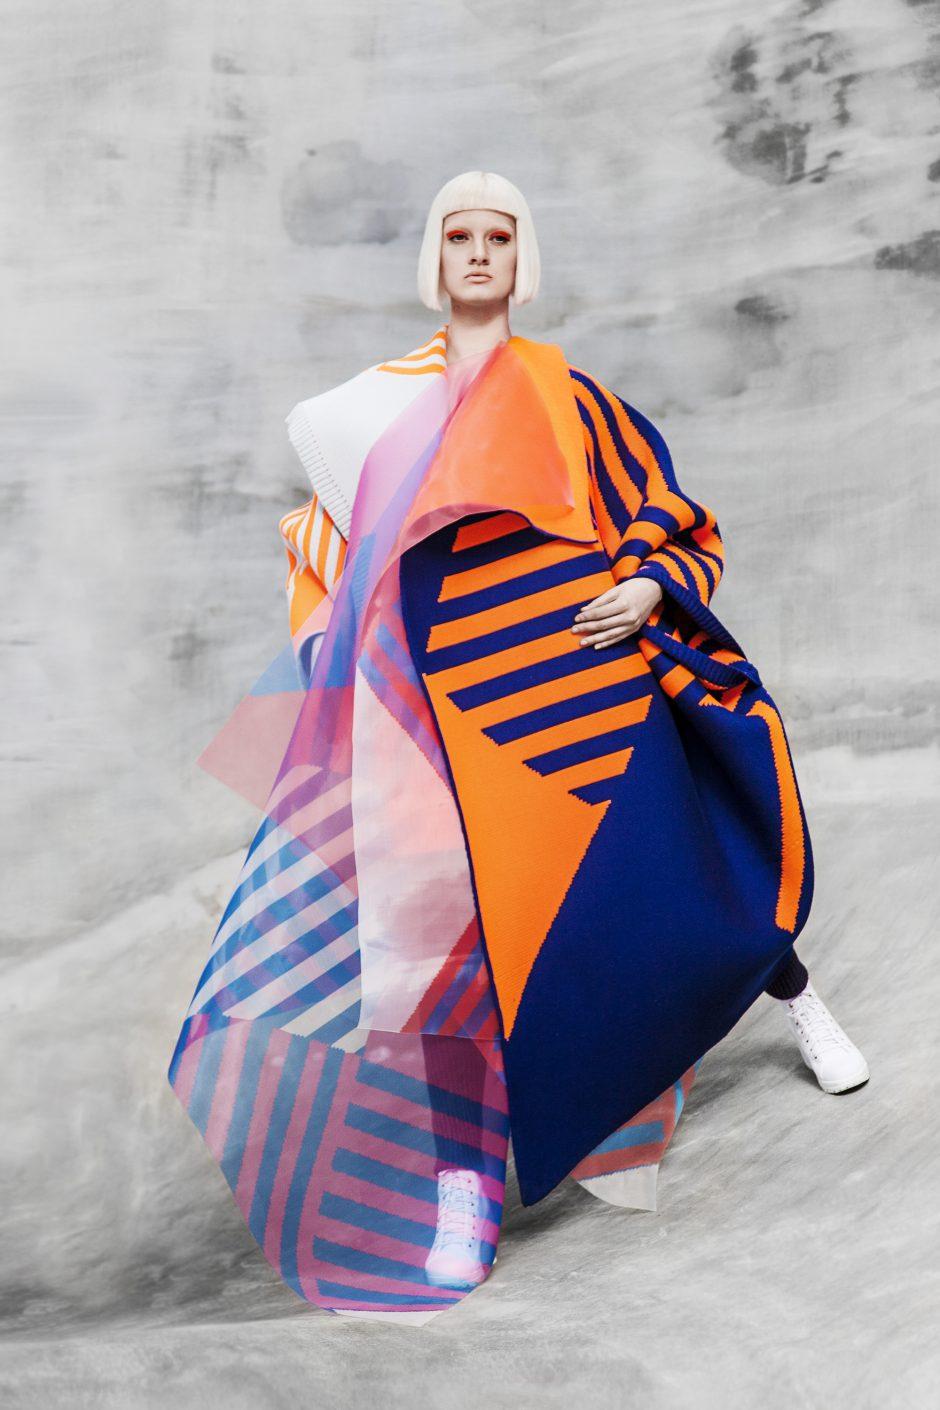 Lindex announces winner of best design idea and collection amongst Borås School of Textiles graduates